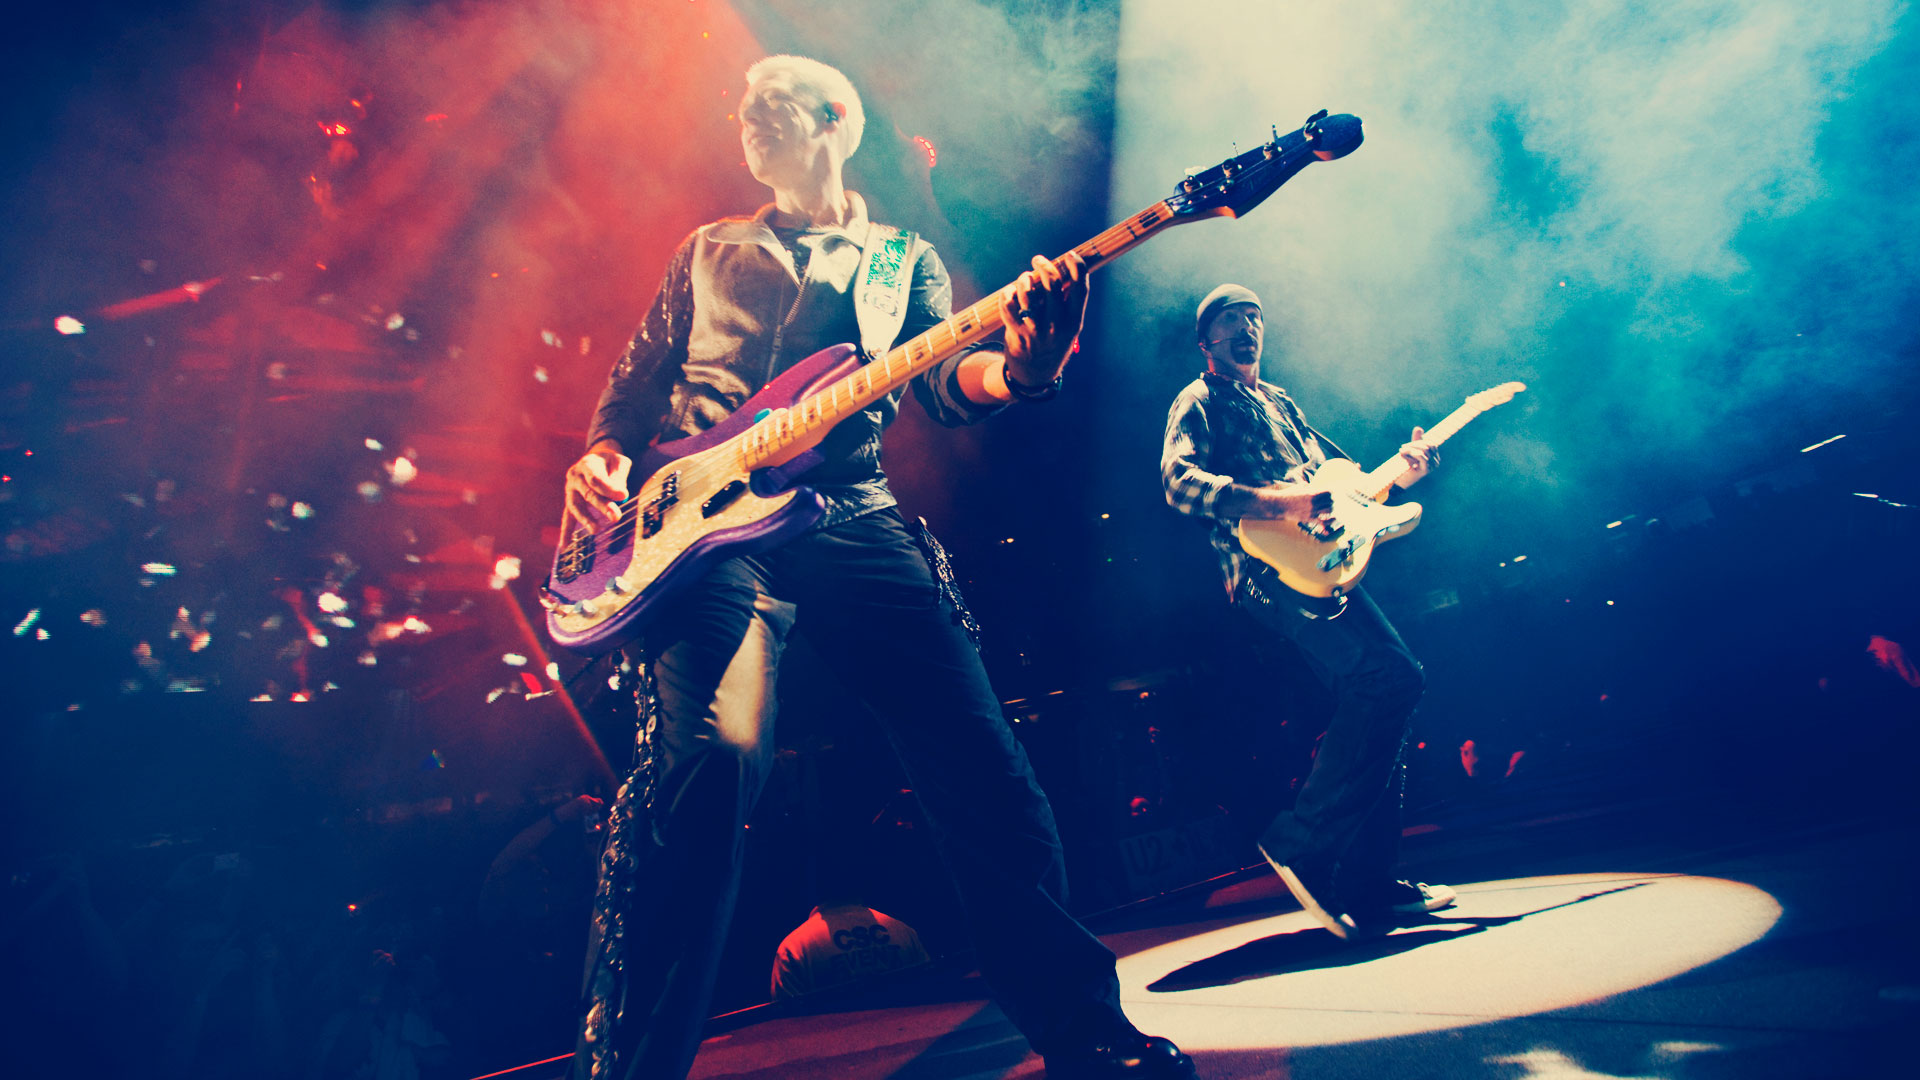 U2 iNNOCENCE + eXPERIENCE Tour 2015, O2 Arena, Hospitality Experience ...